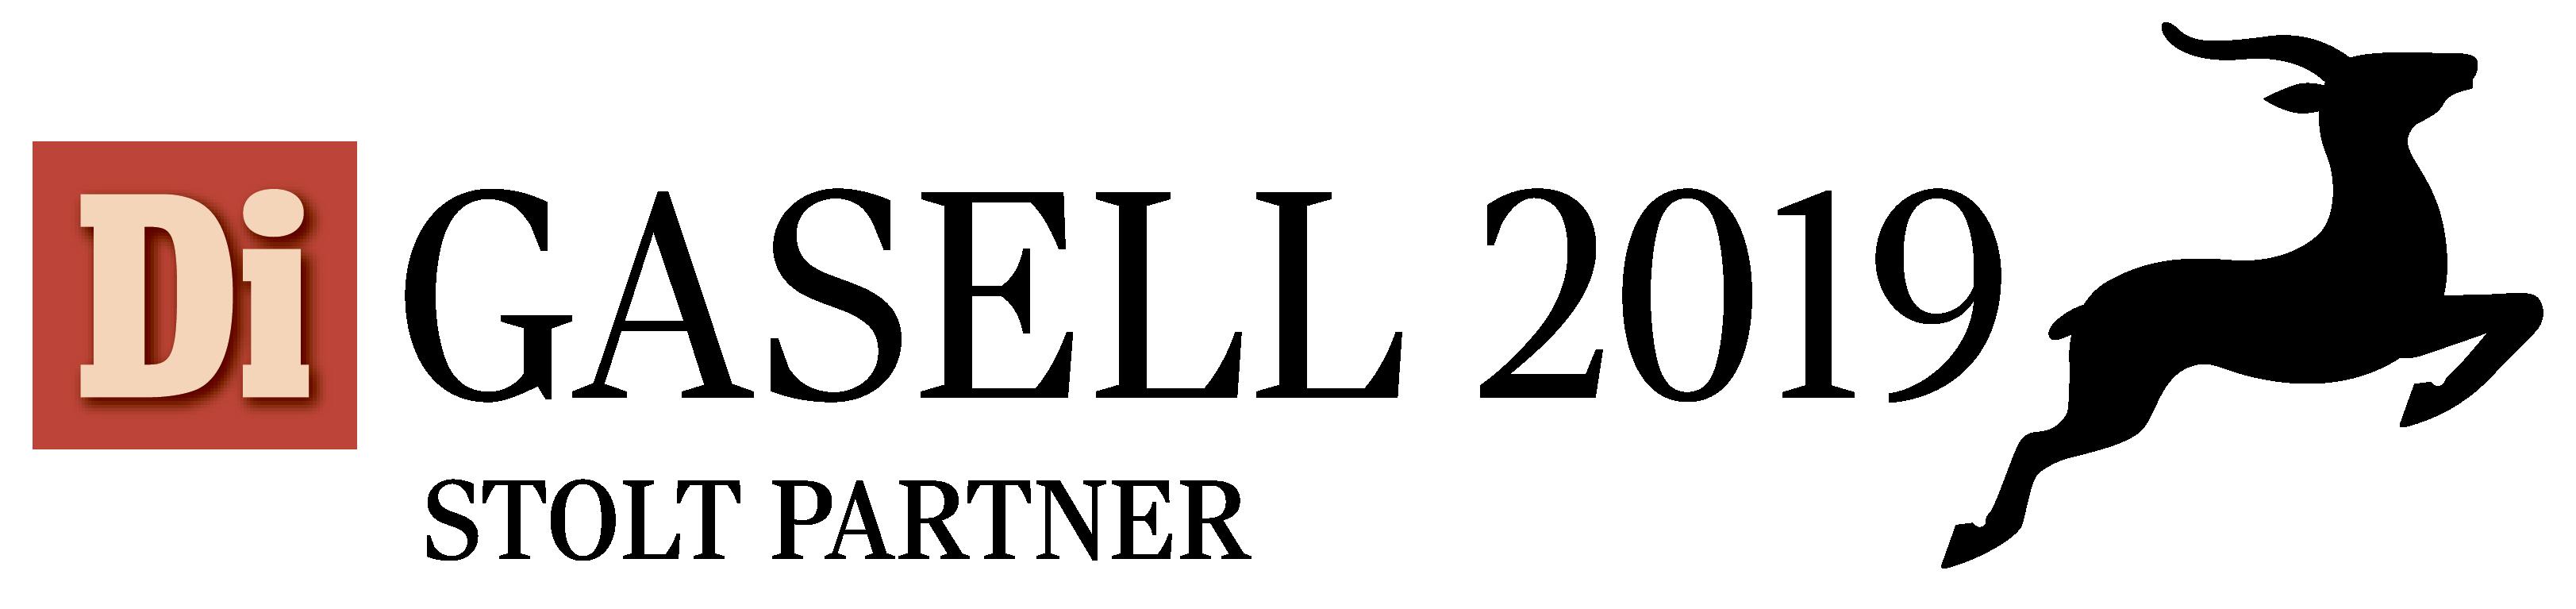 dating tullen i Central Amerika